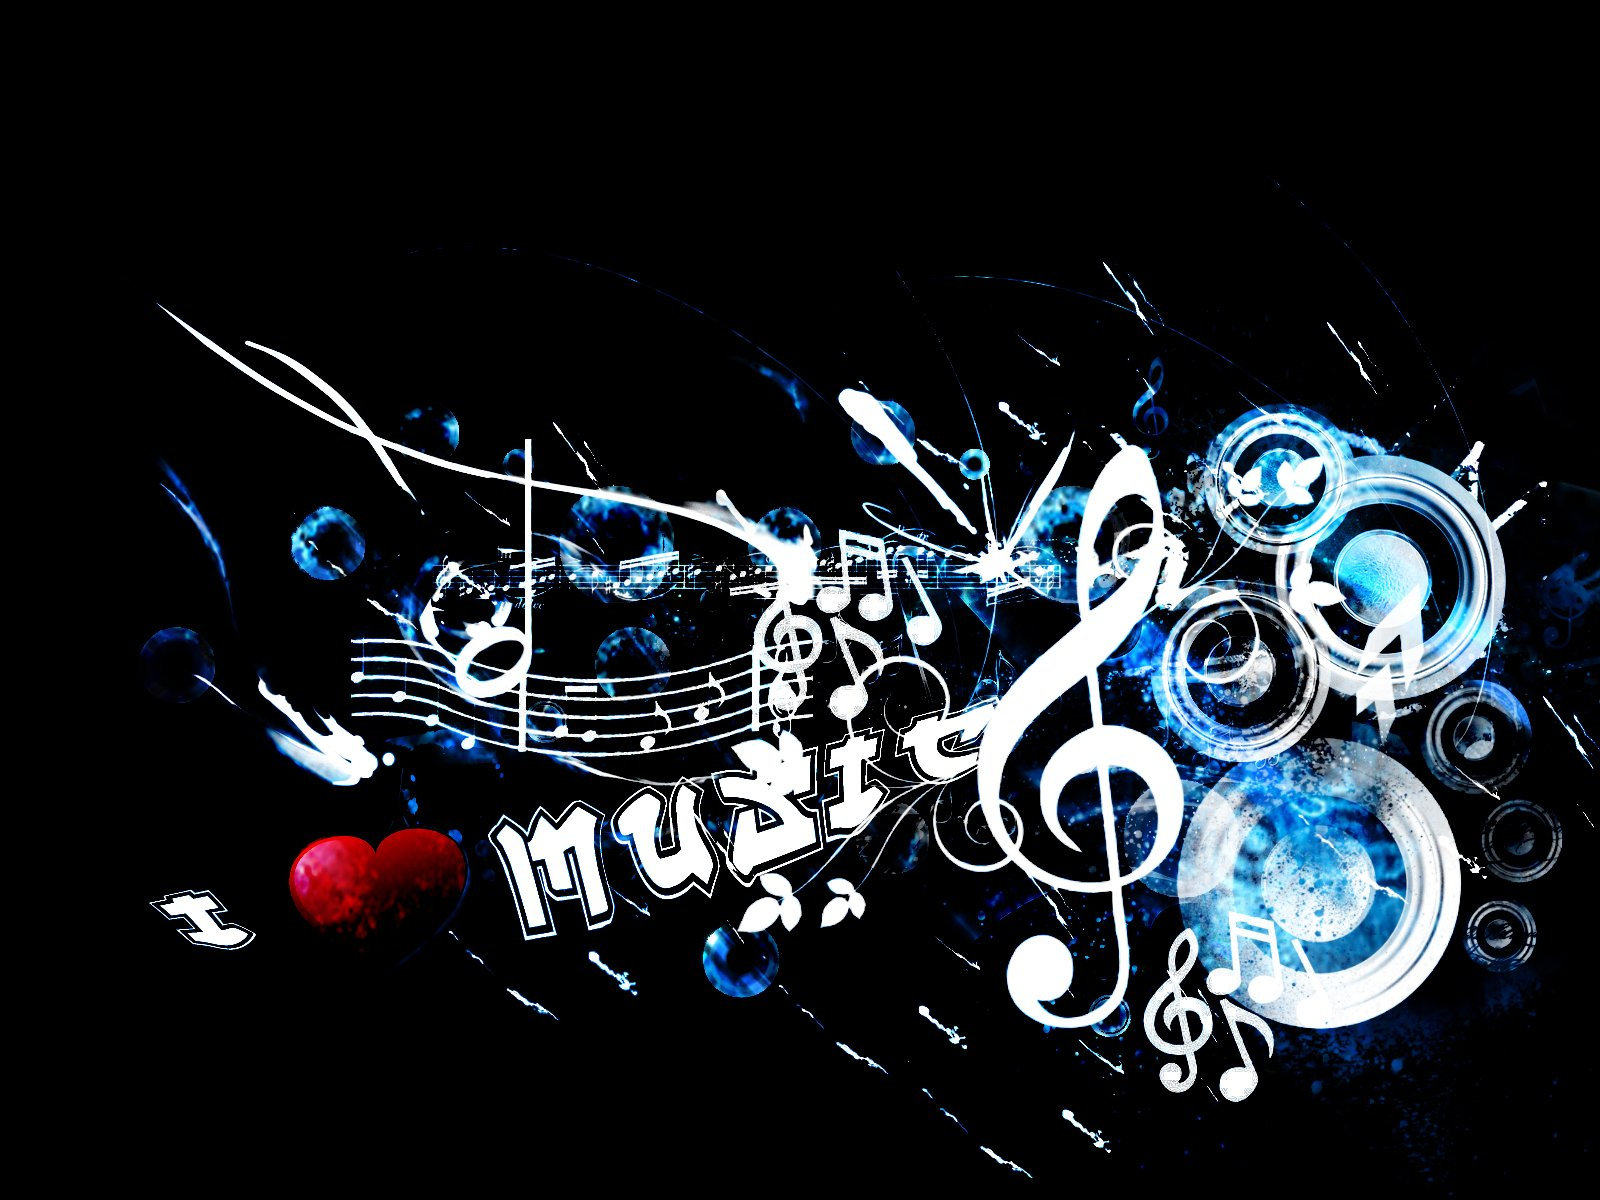 Music Hd Wallpapers Hd Music Screensavers Desktop Wallpapers Wide 1600x1200